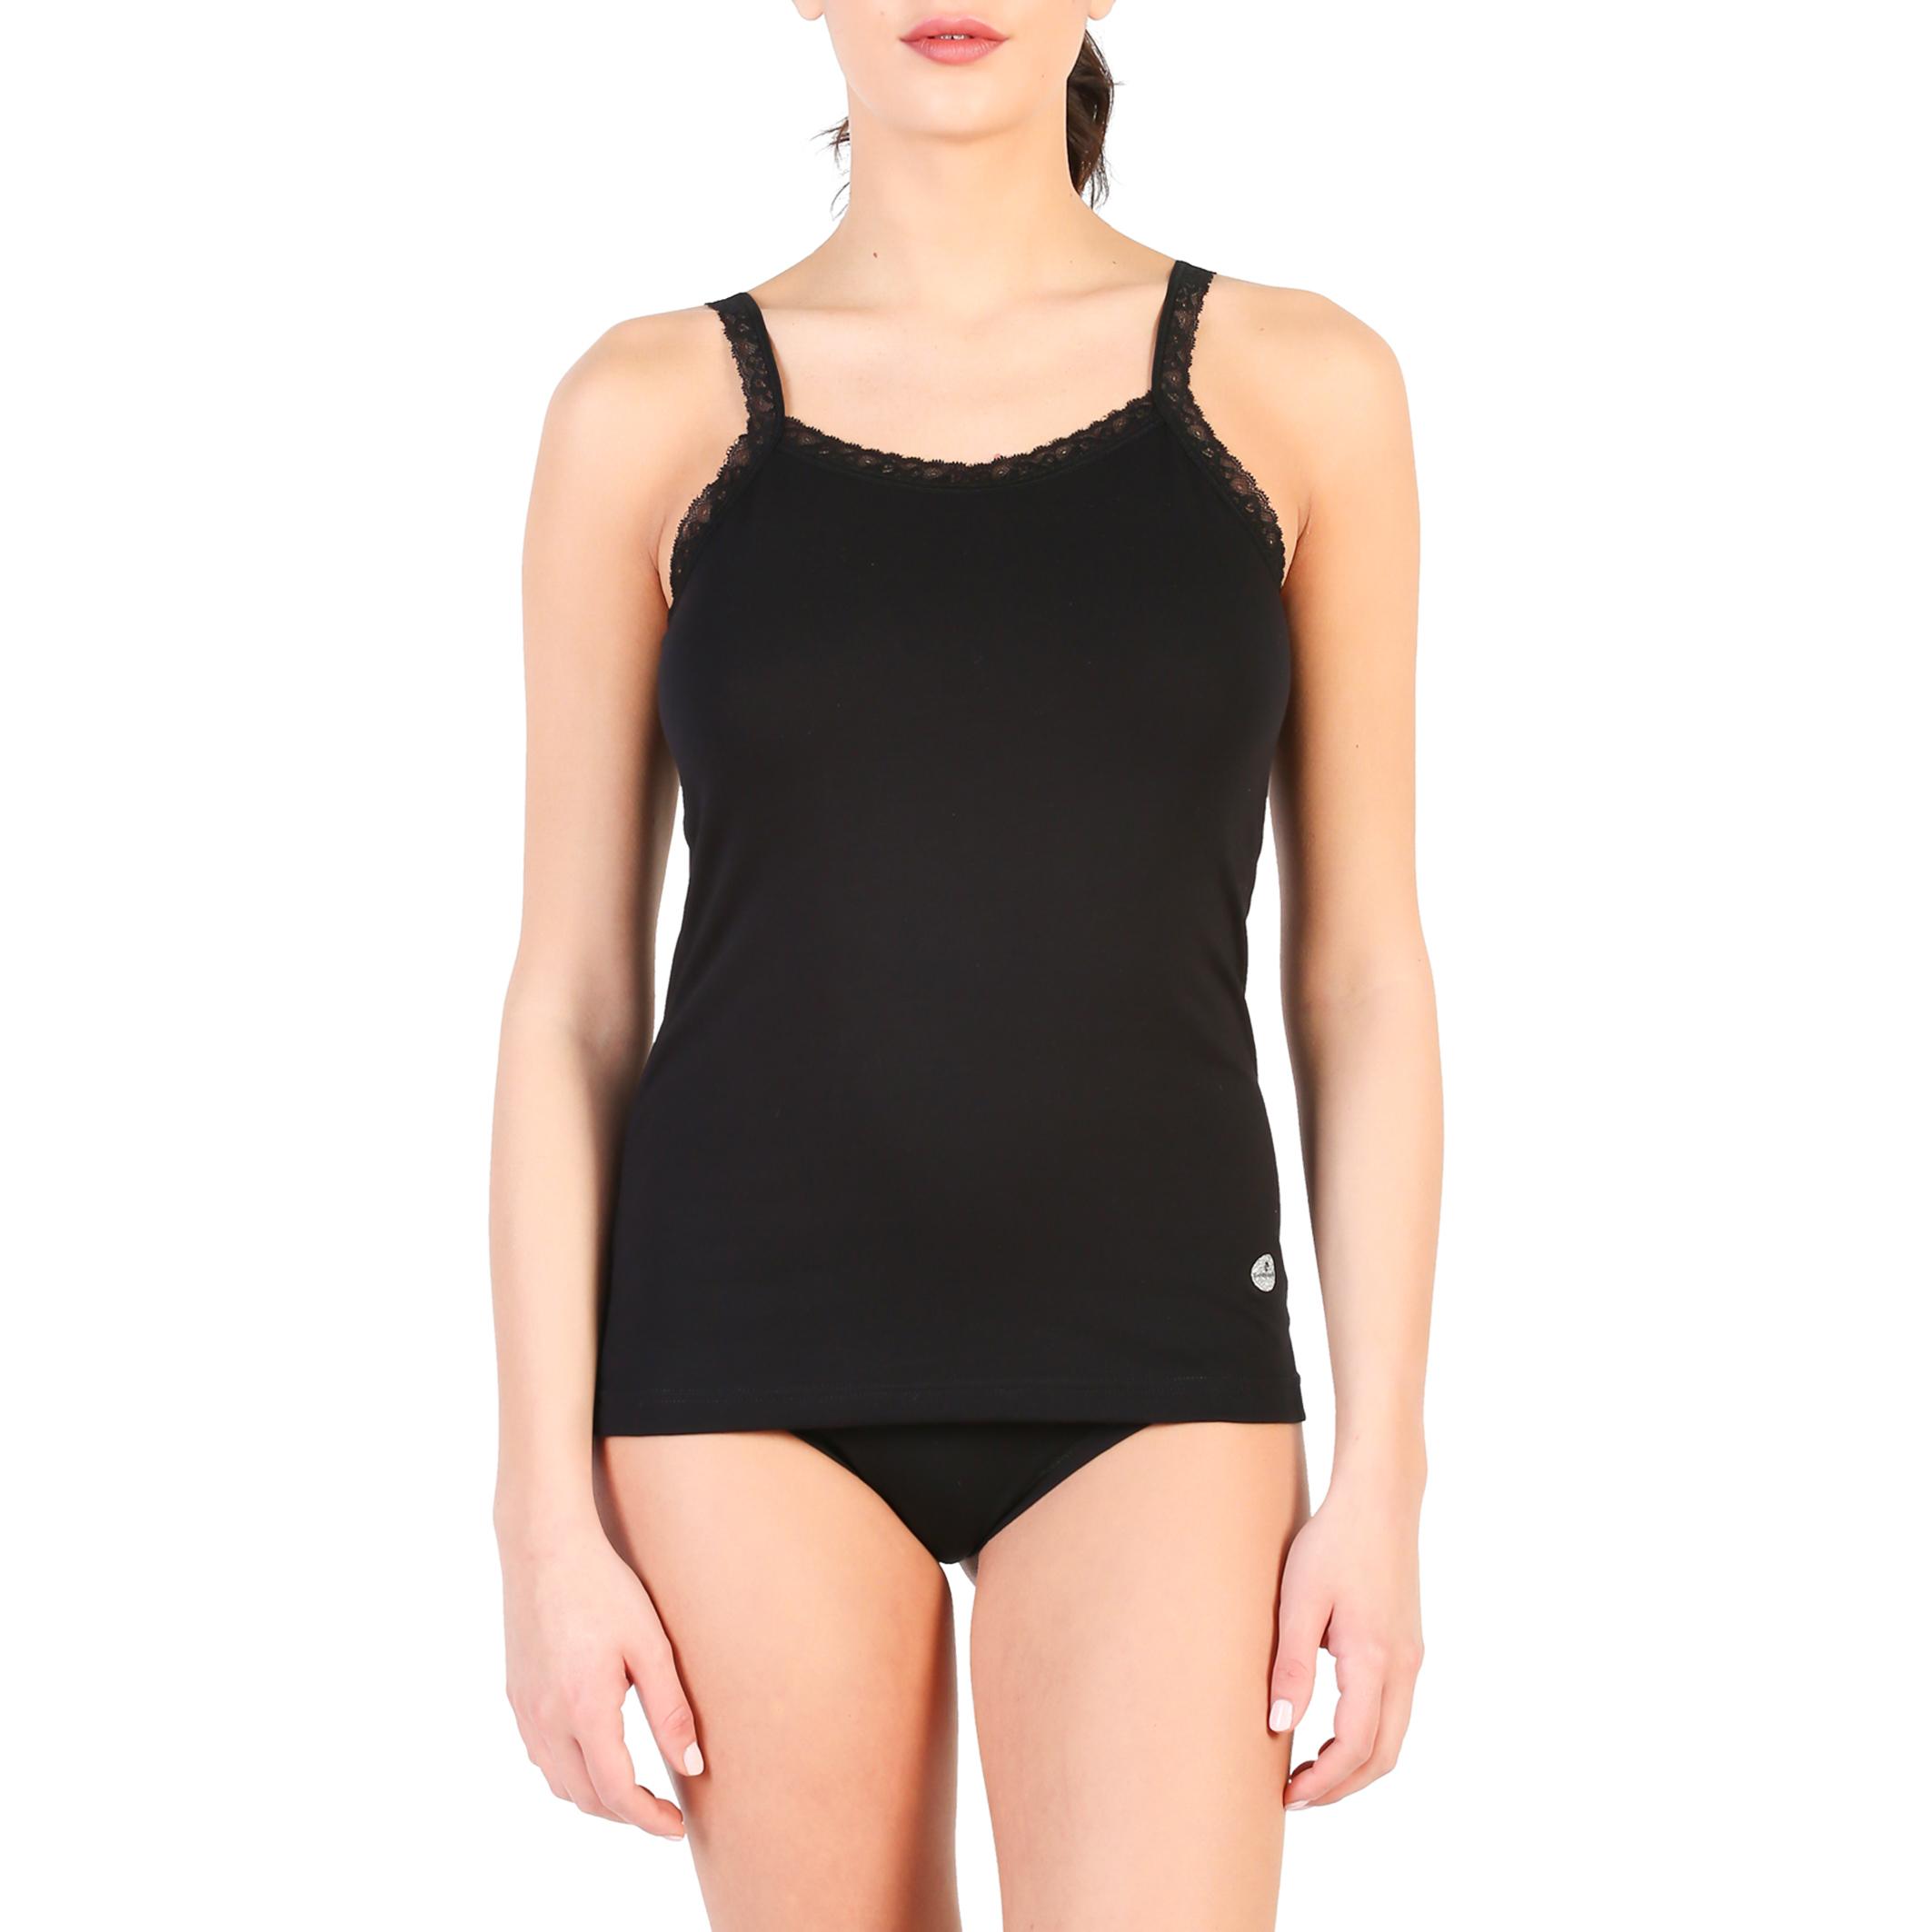 Pierre Cardin underwear PC_CAMELIA_C Donna Nero 87825